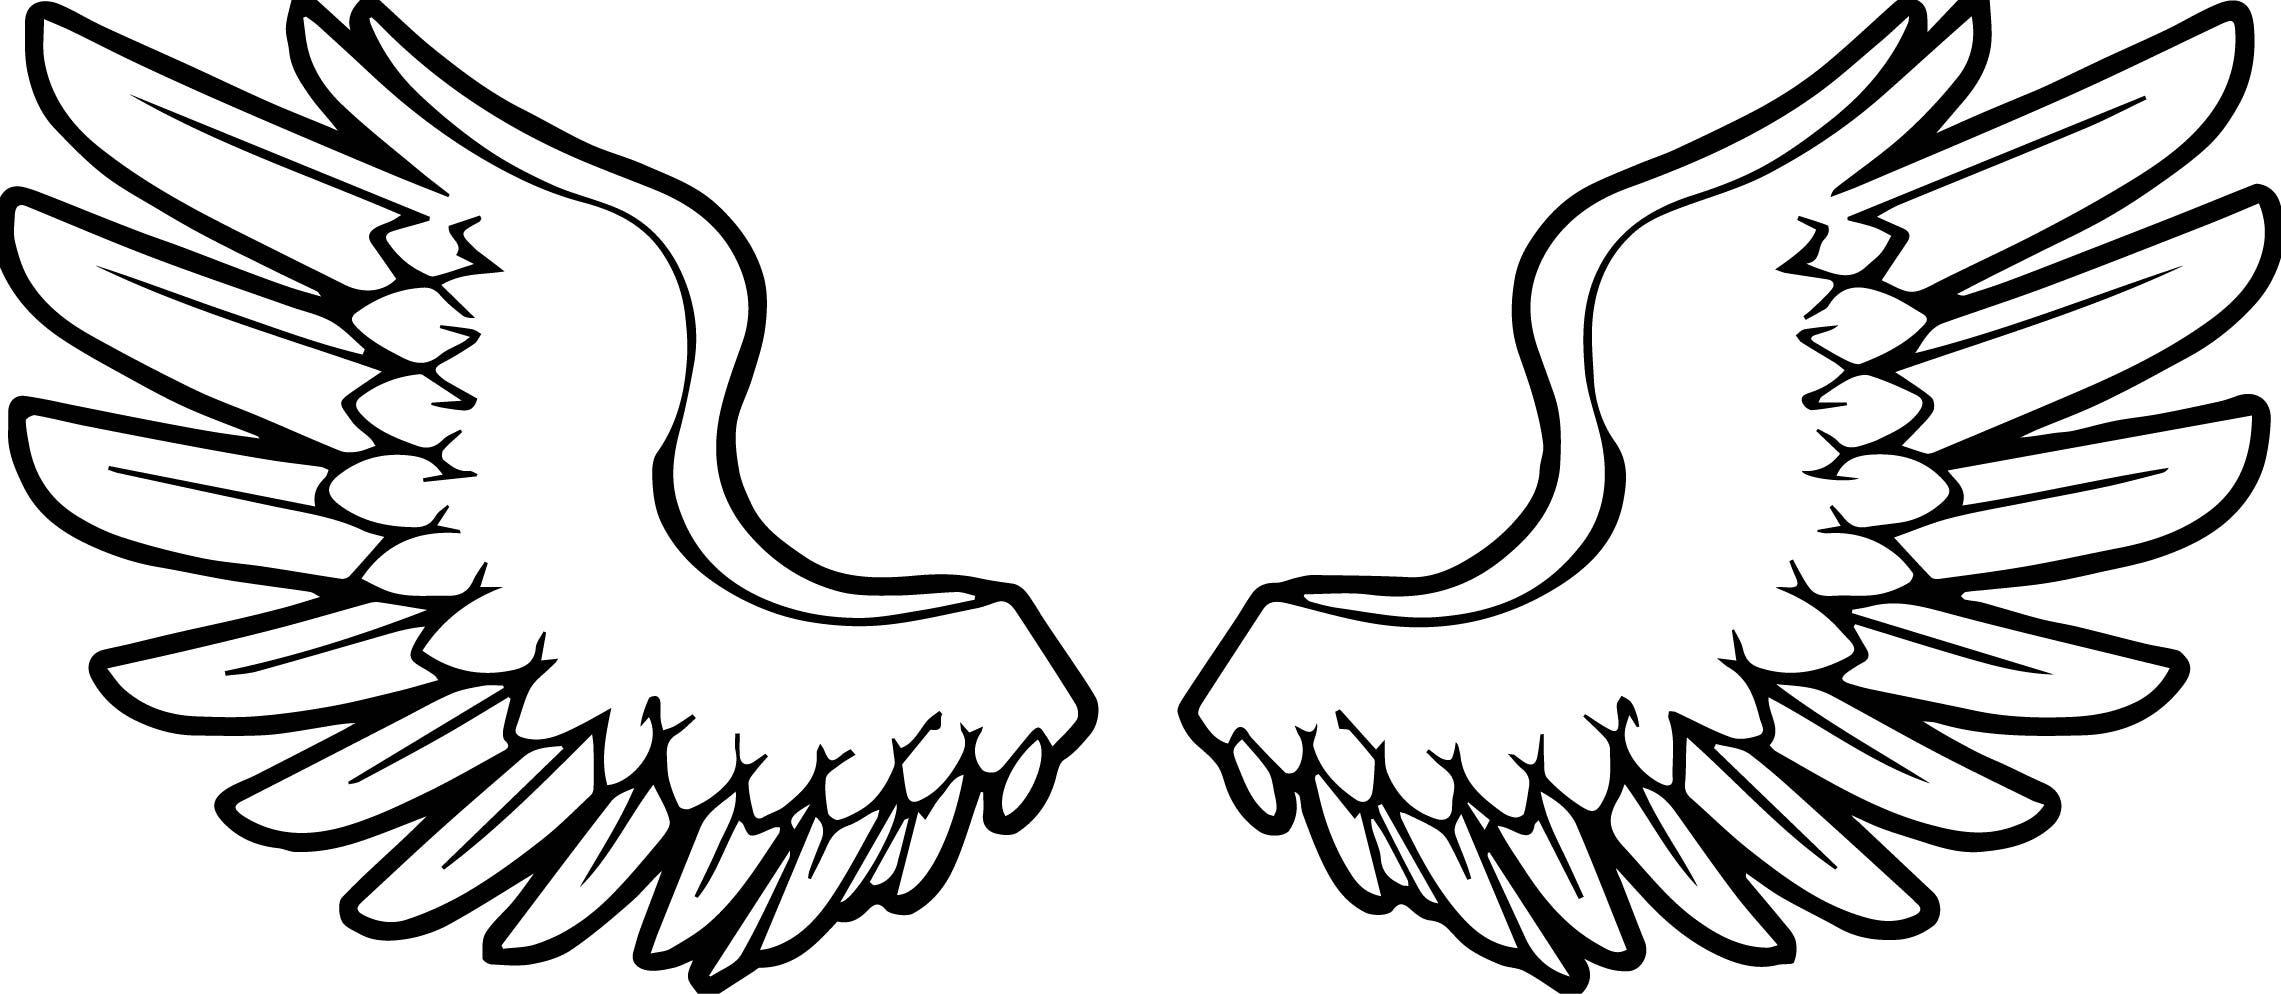 Angel Wings Angel Coloring Page Unicorn Wings Angel Coloring Pages Coloring Pages